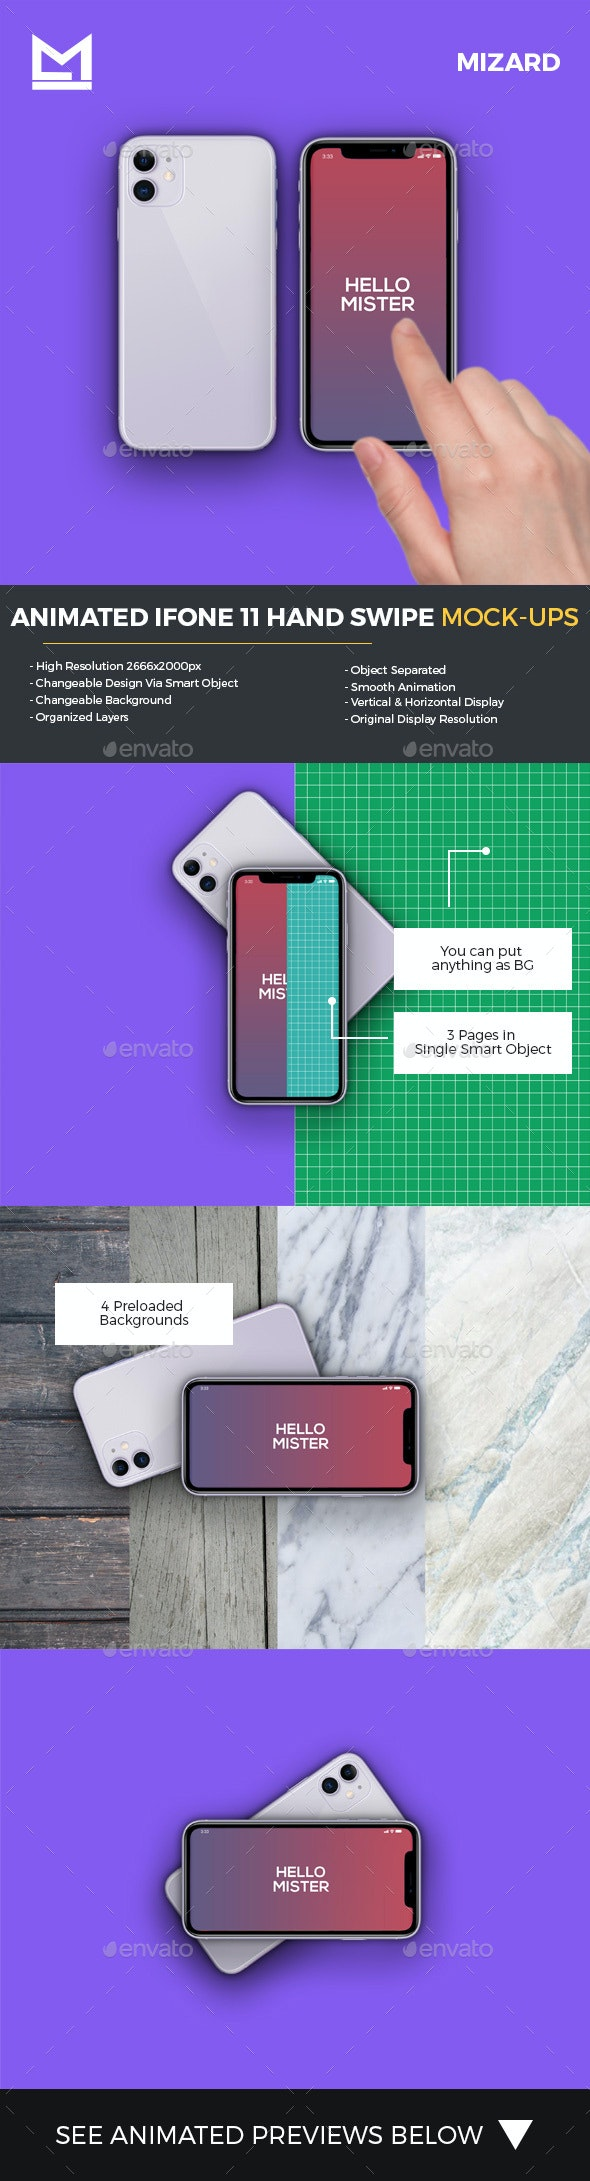 Animated iFone 11 Hand Swipe Mockup - Product Mock-Ups Graphics